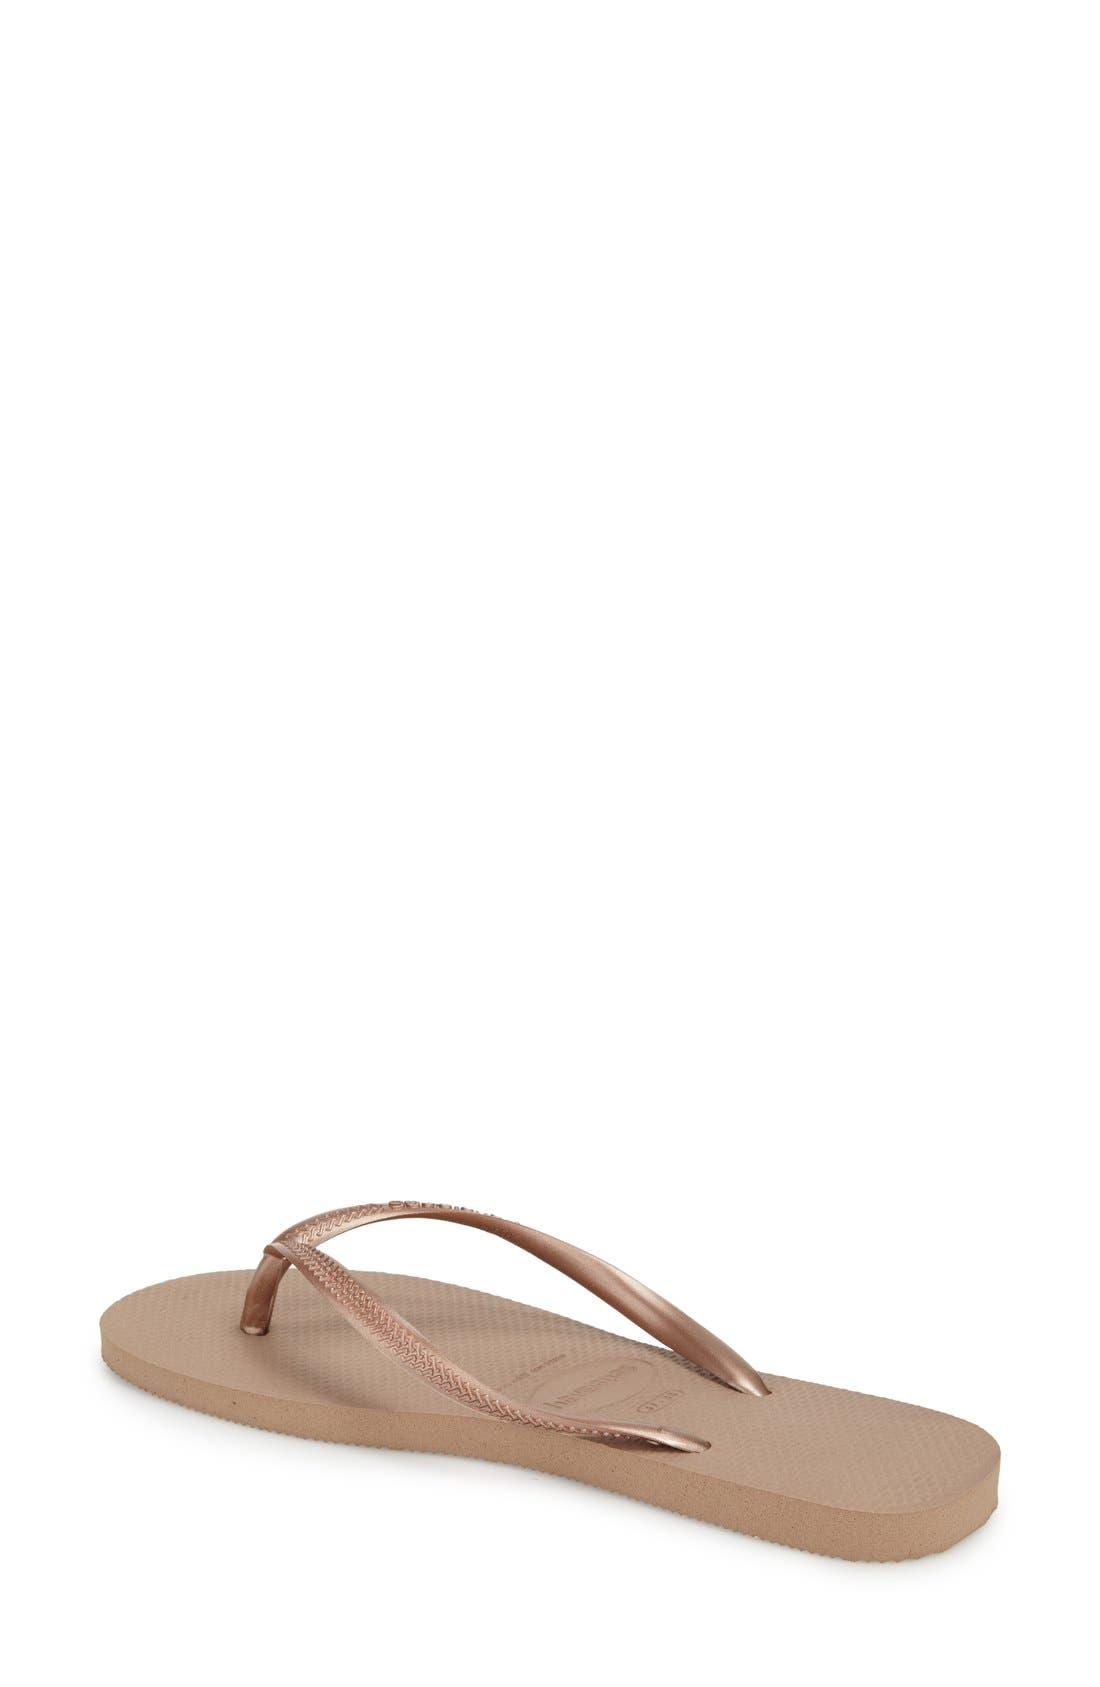 Womens Green Sandals Nordstrom Buenos Ninos Vintage Mini Dress Brown